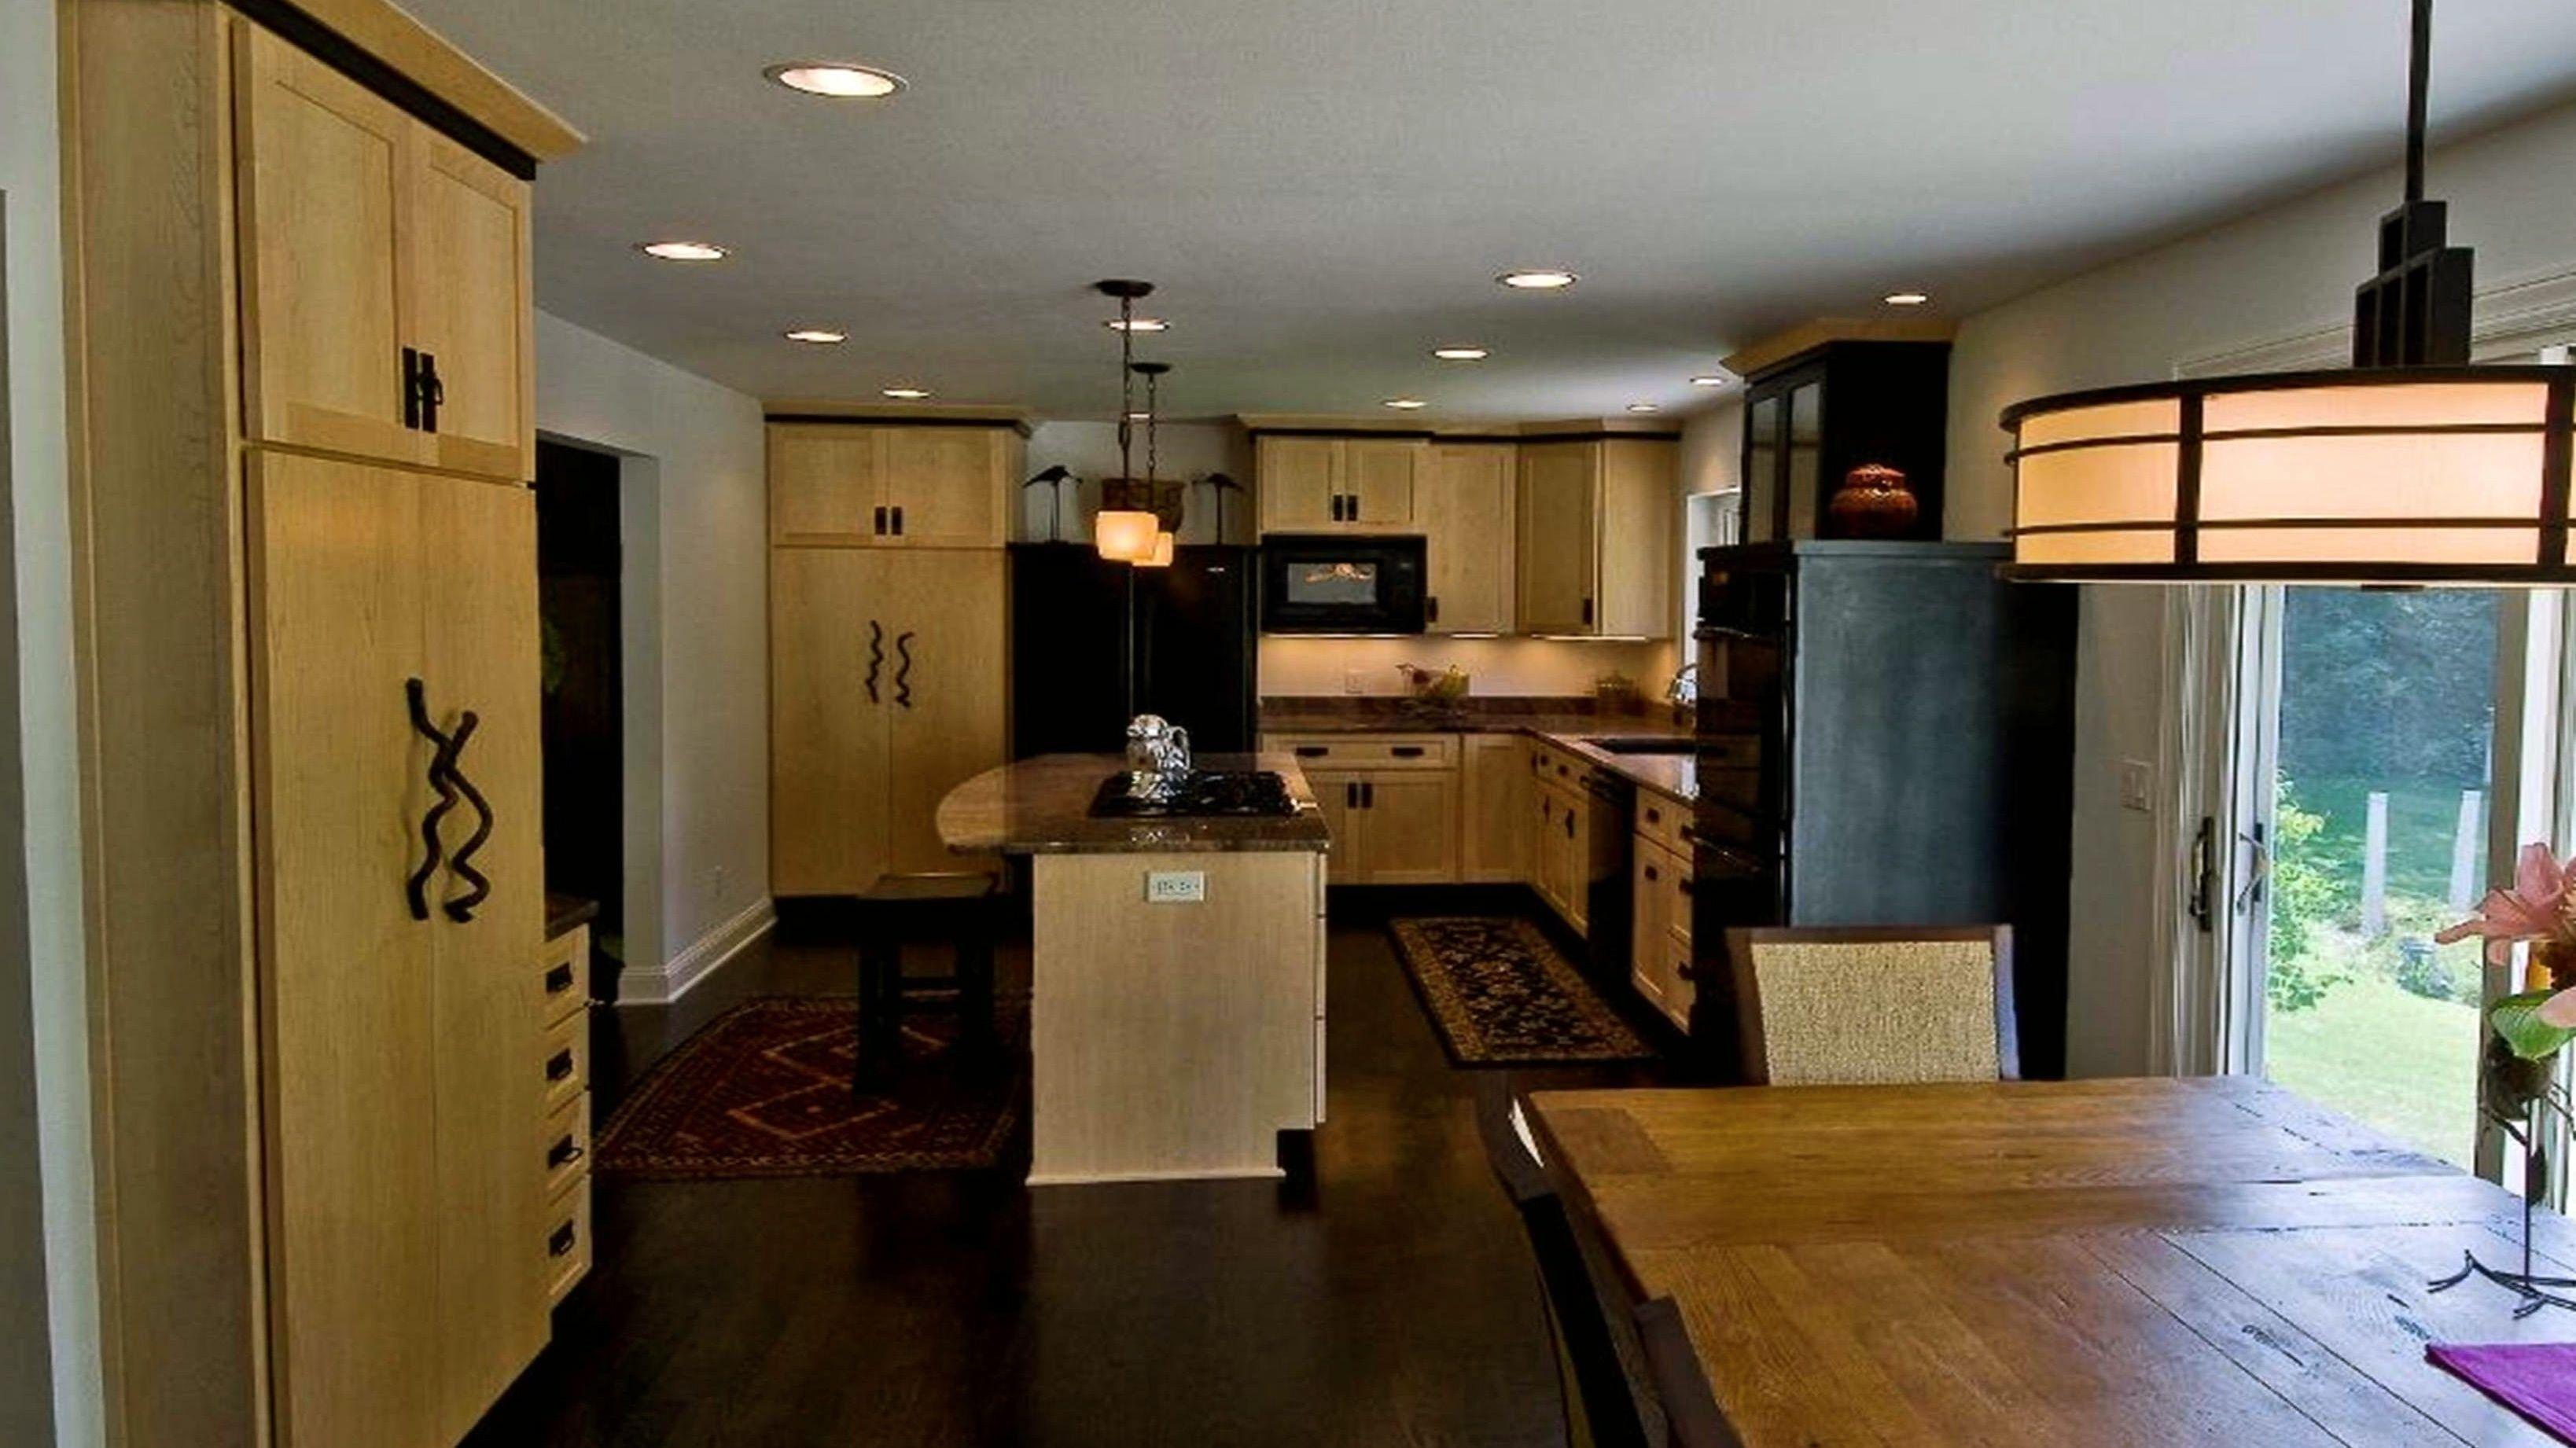 Walnut floors, maple cabinets, dark countertops, soft yellow walls ...